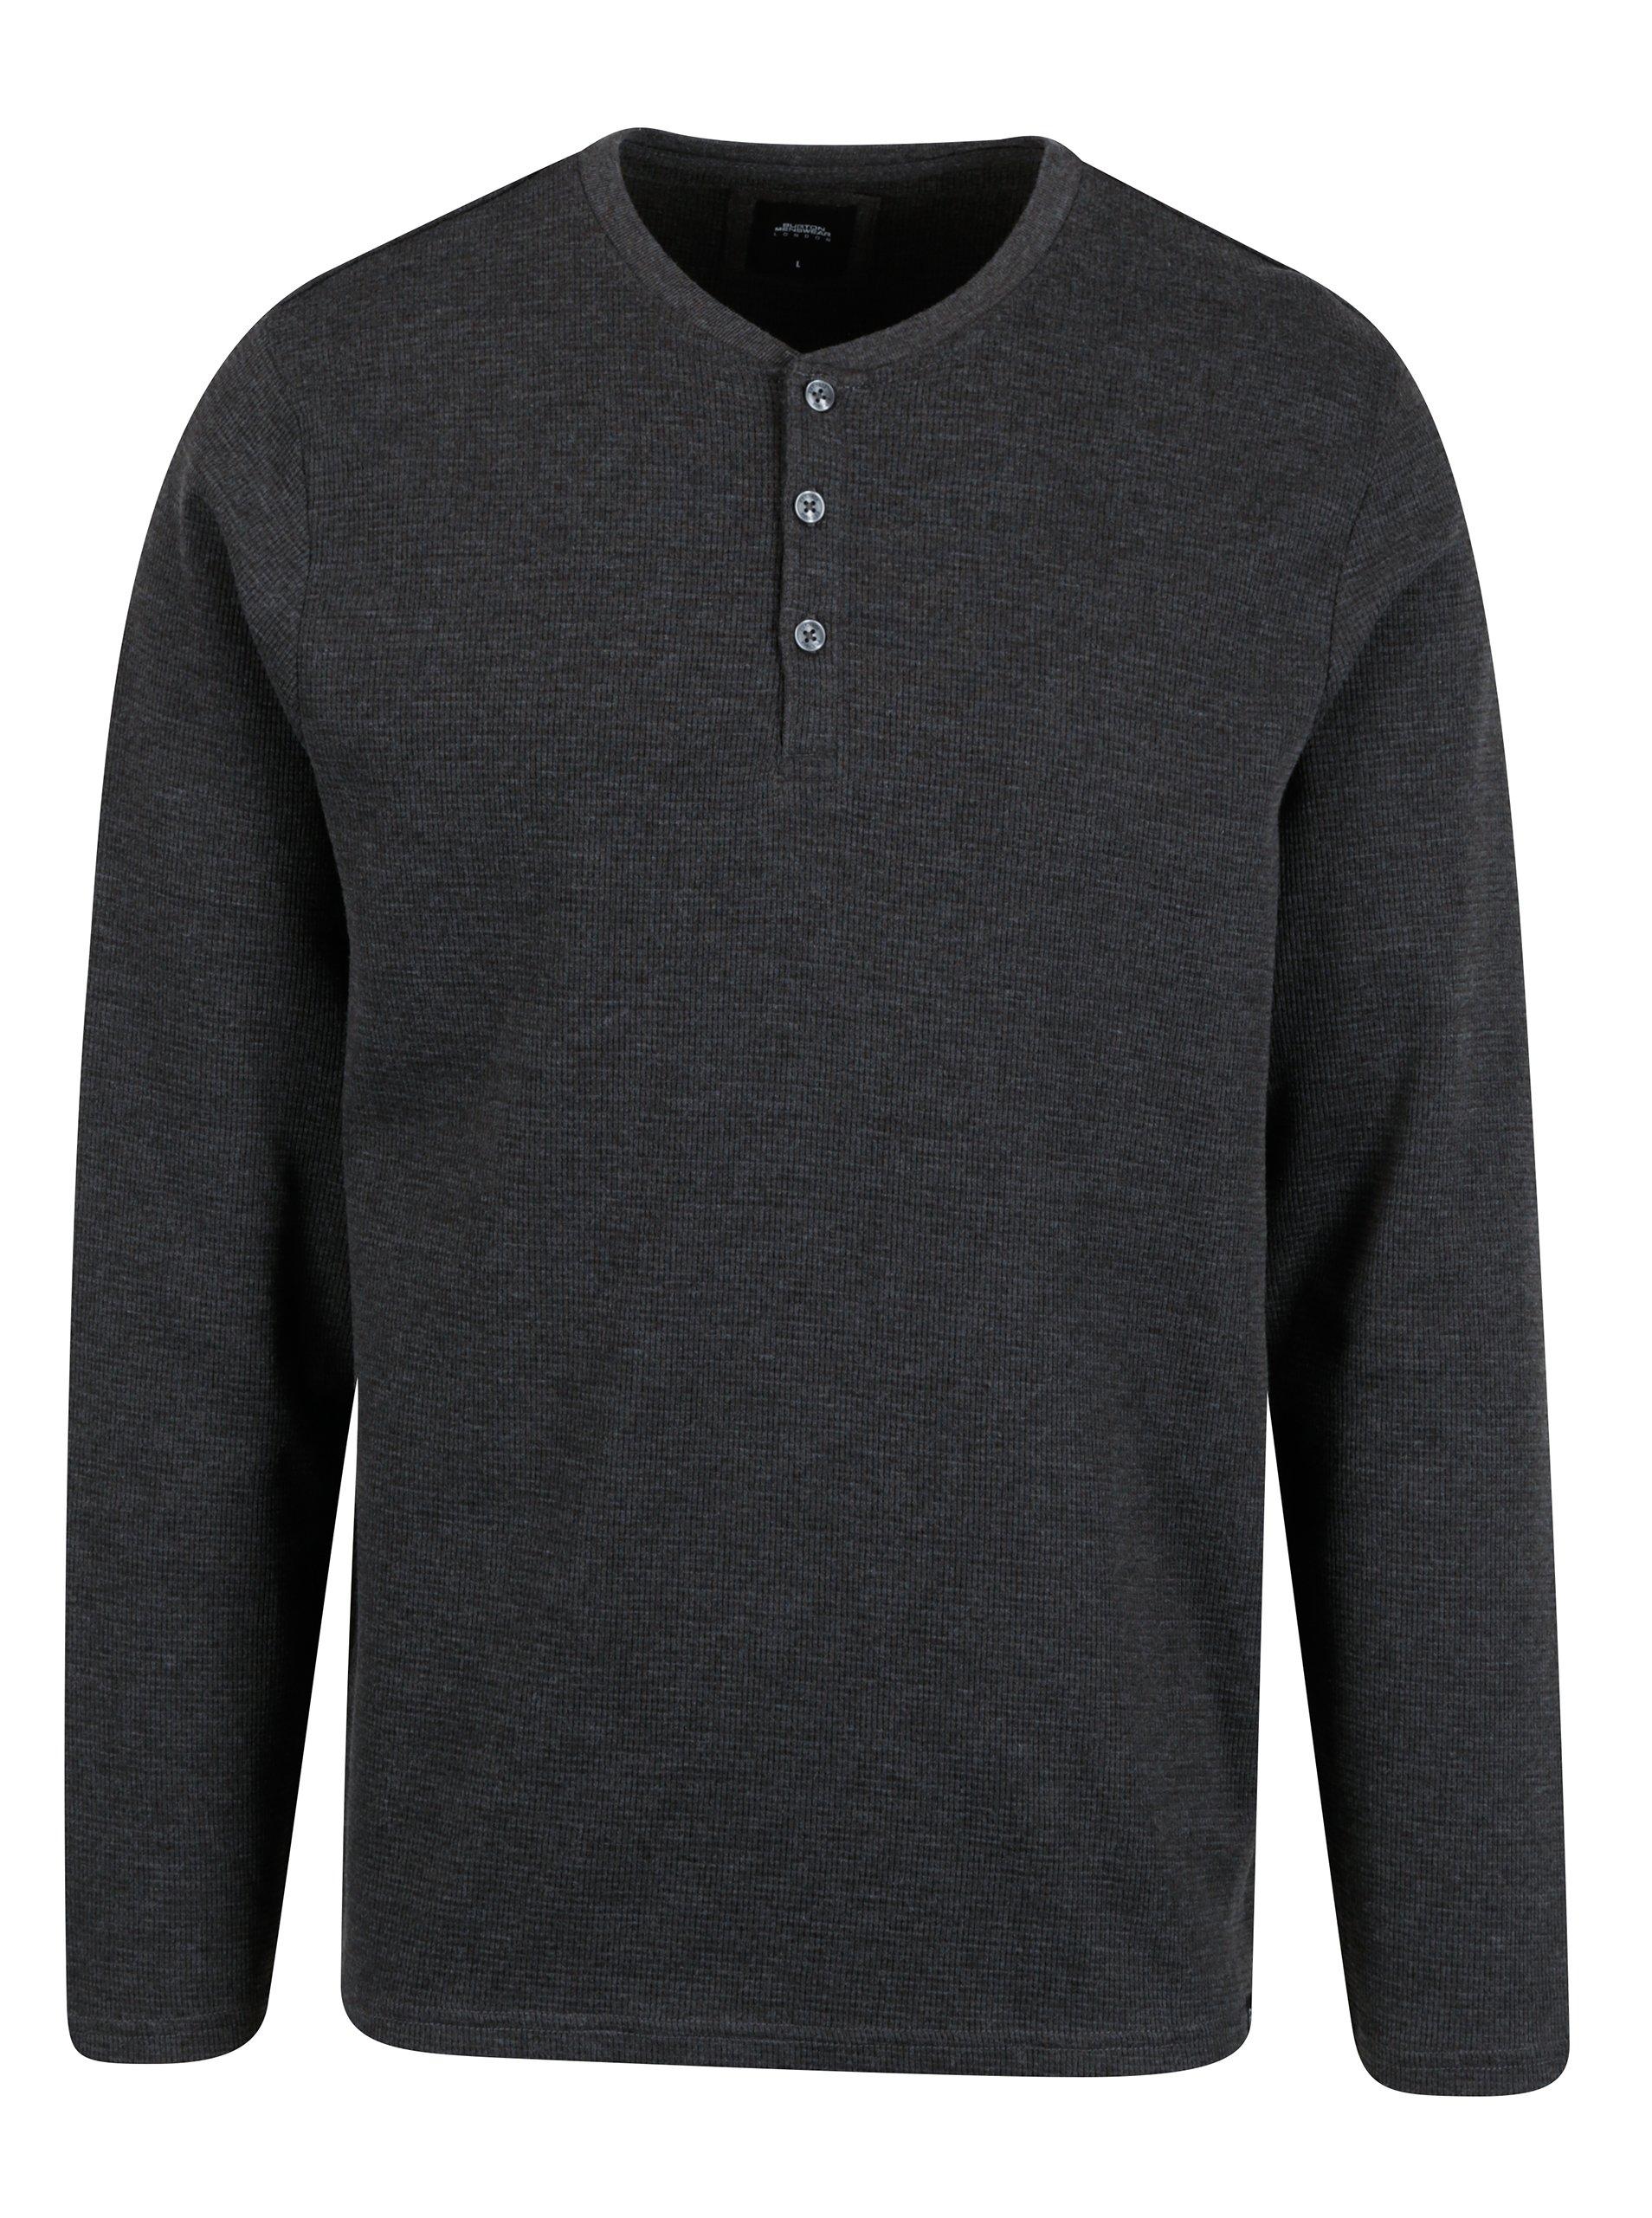 Tmavě šedé tričko s knoflíky Burton Menswear London